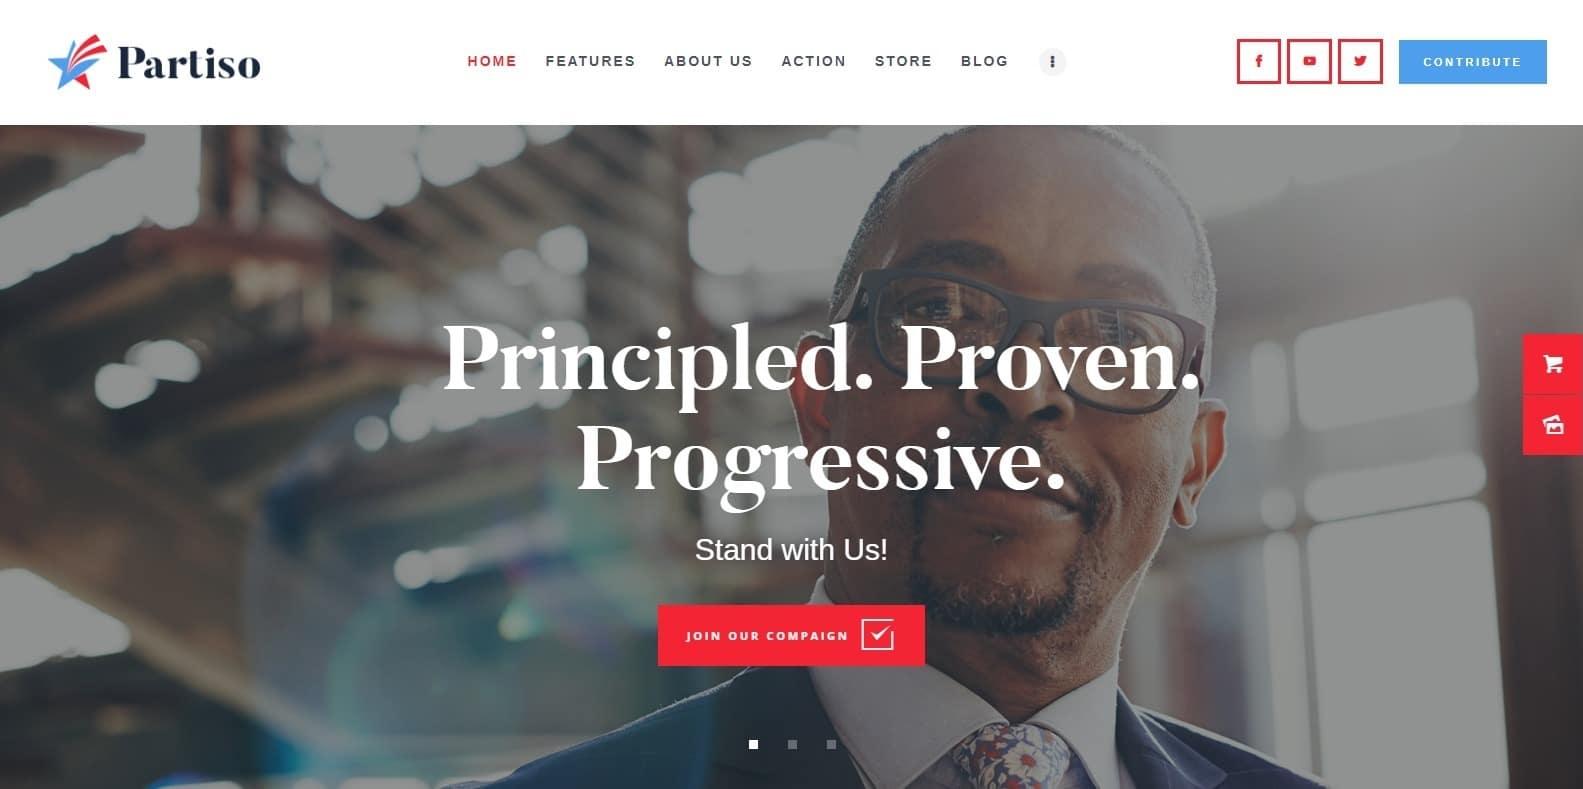 partiso-political-website-template